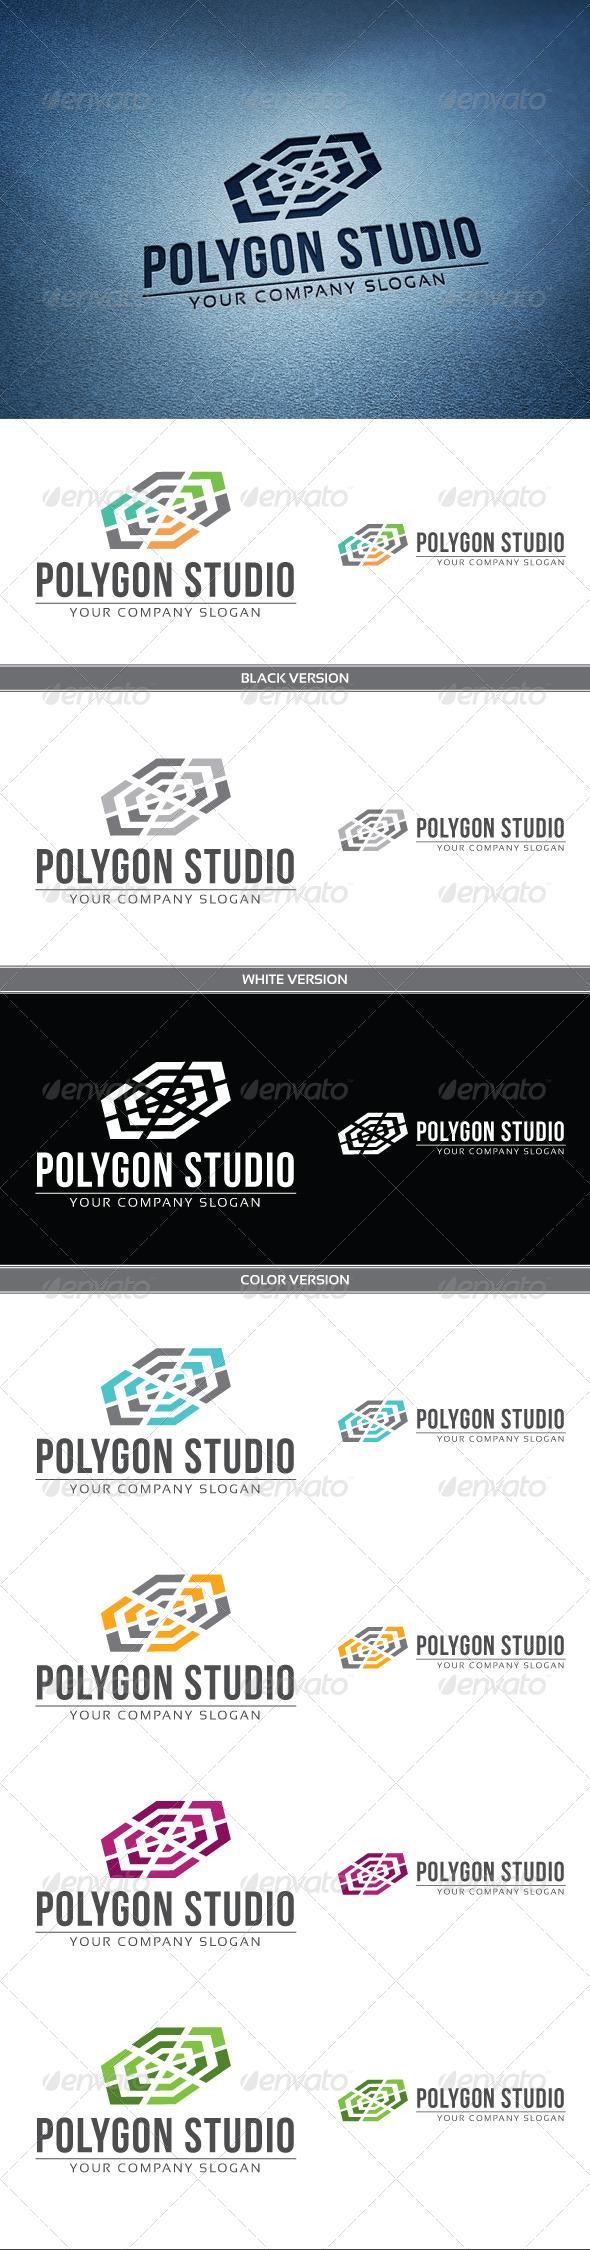 Polygon Studio Logo - Objects Logo Templates